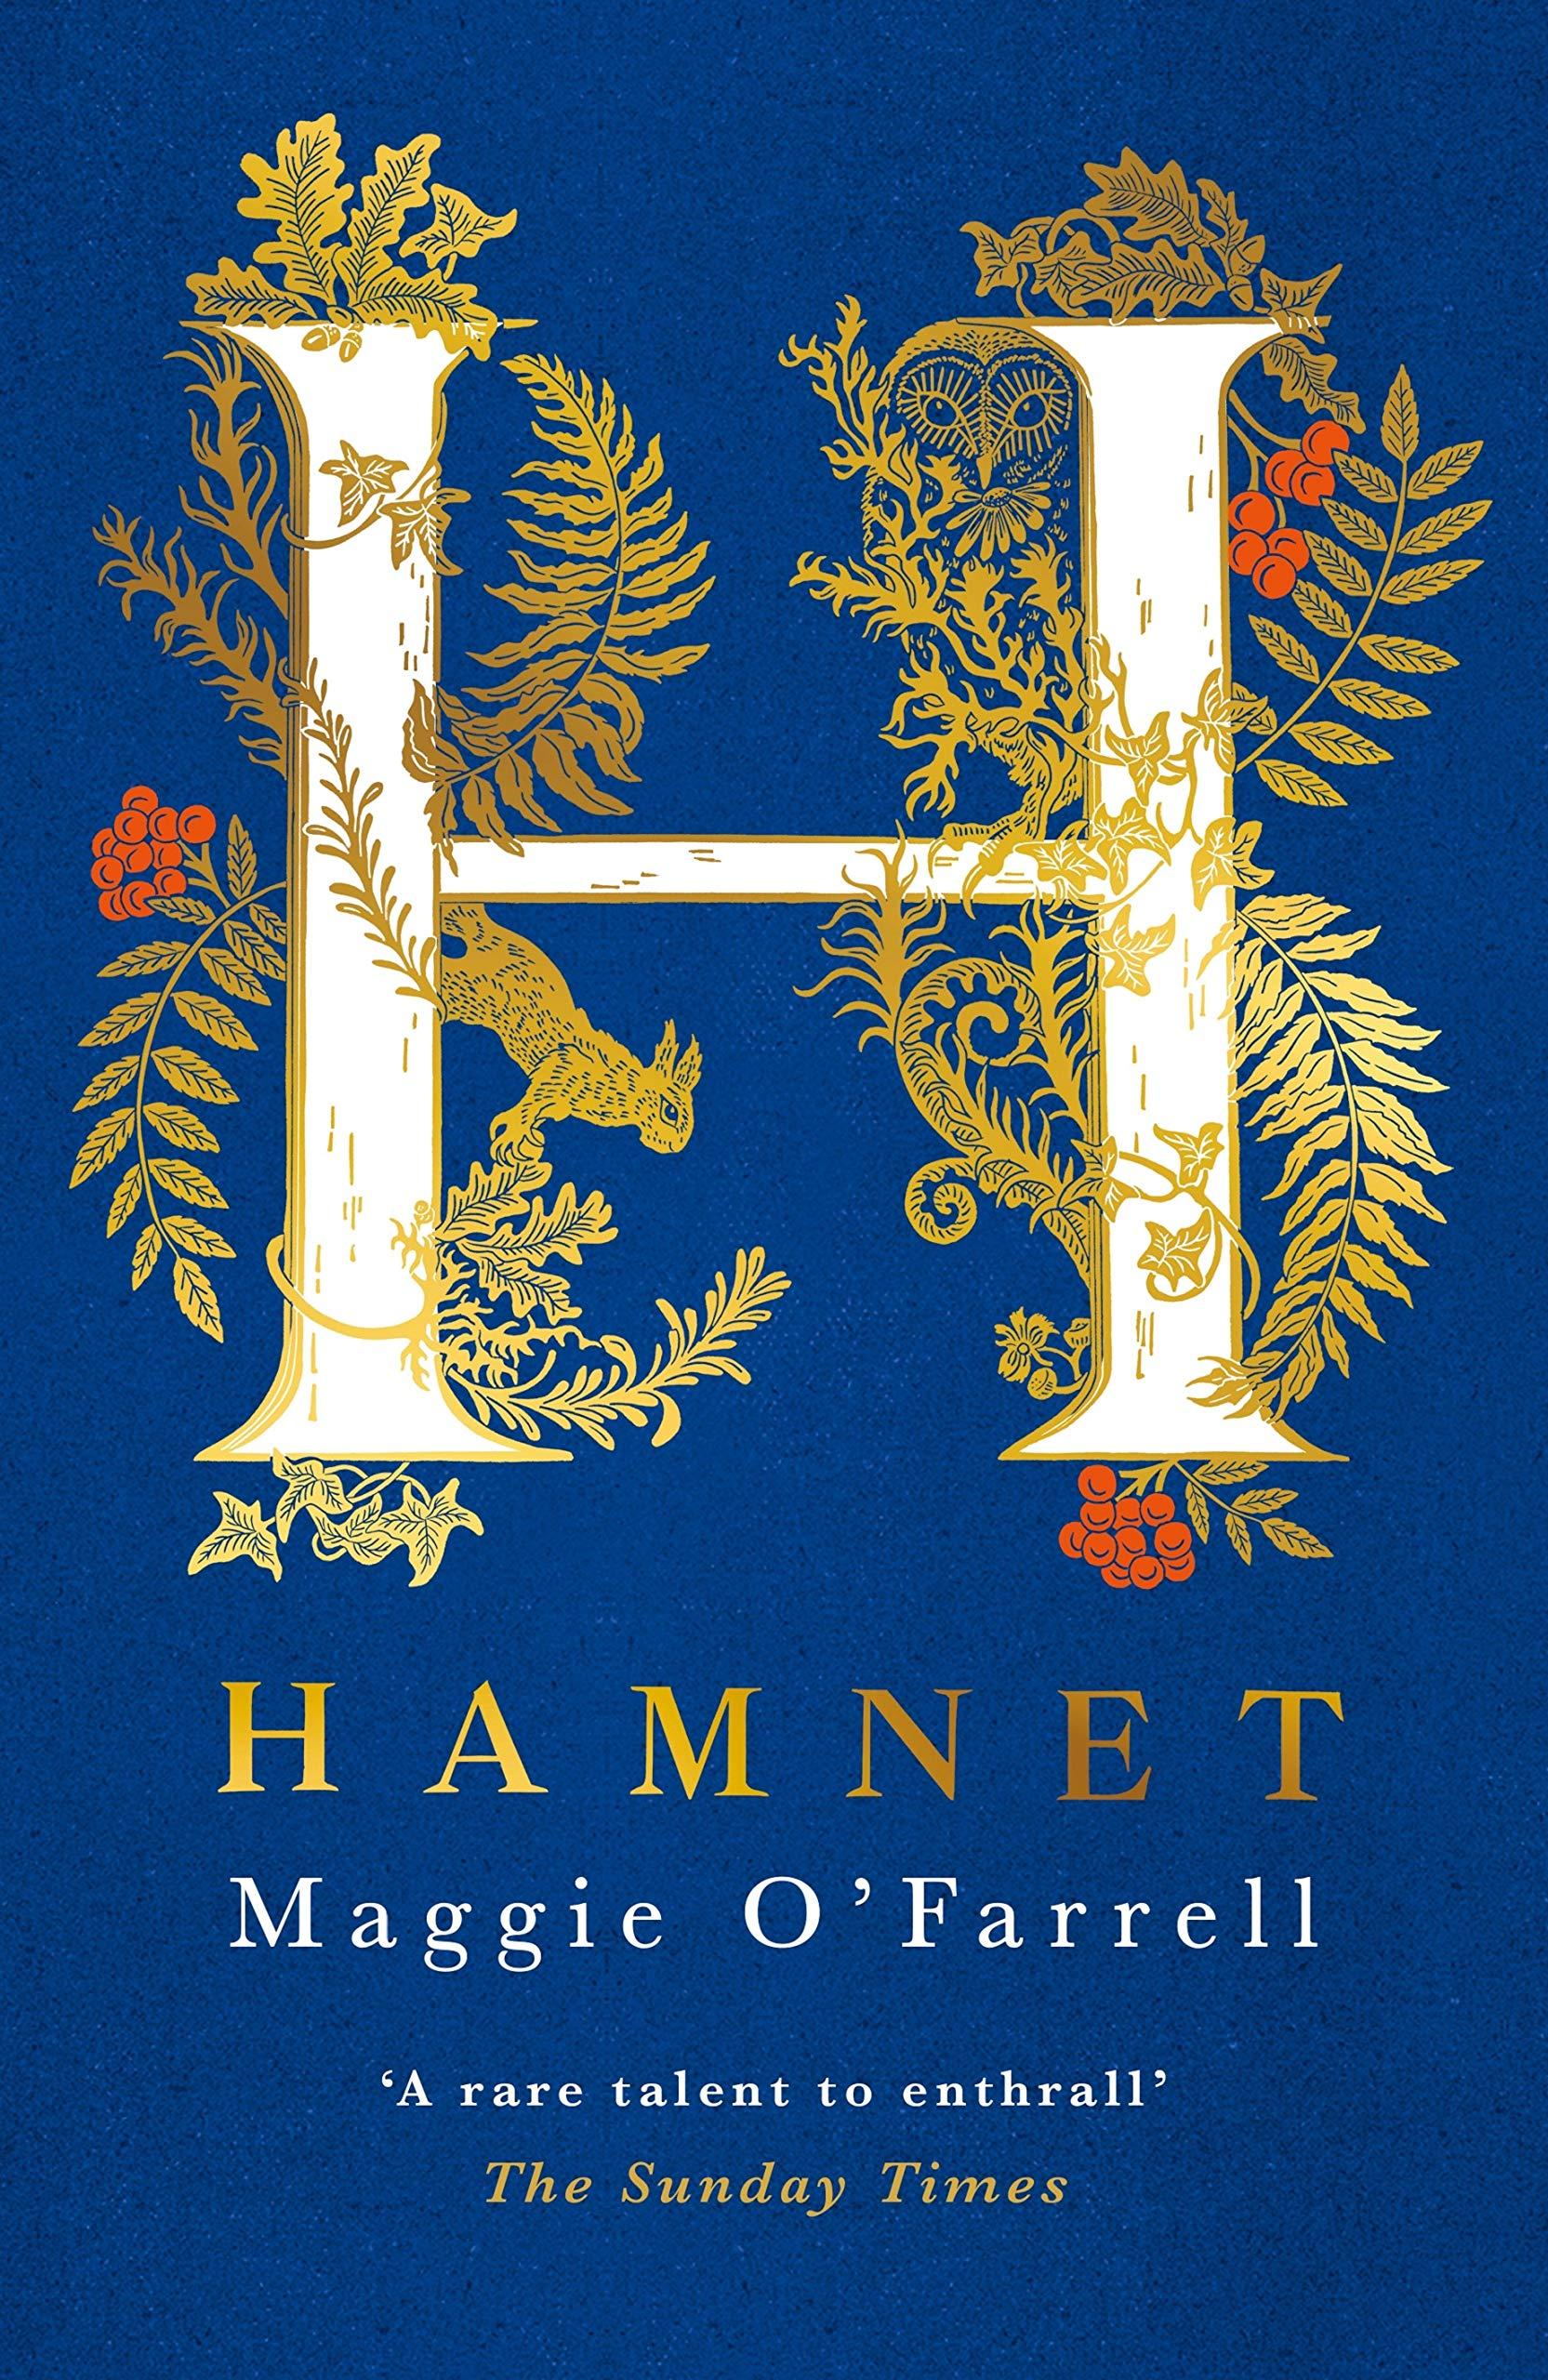 Image result for hamnet maggie o'farrell